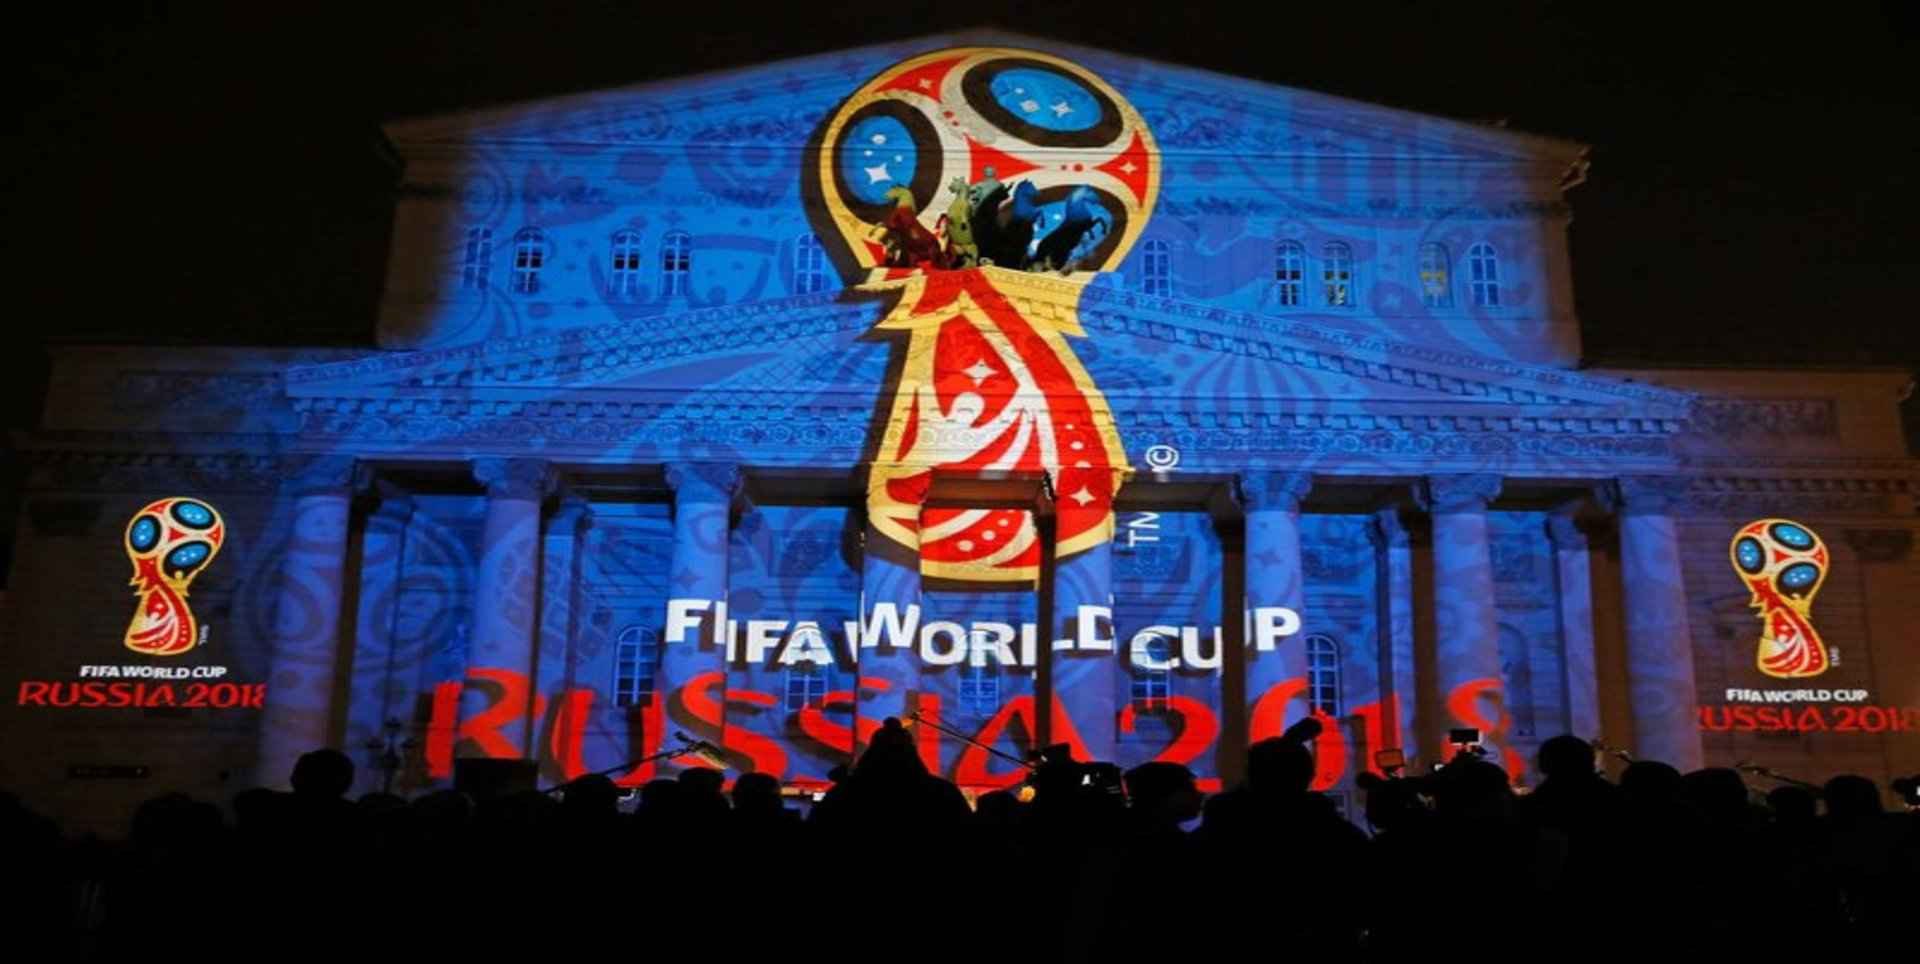 Cameroon vs Croatia GROUP A 18 JUN 2014 Highlights